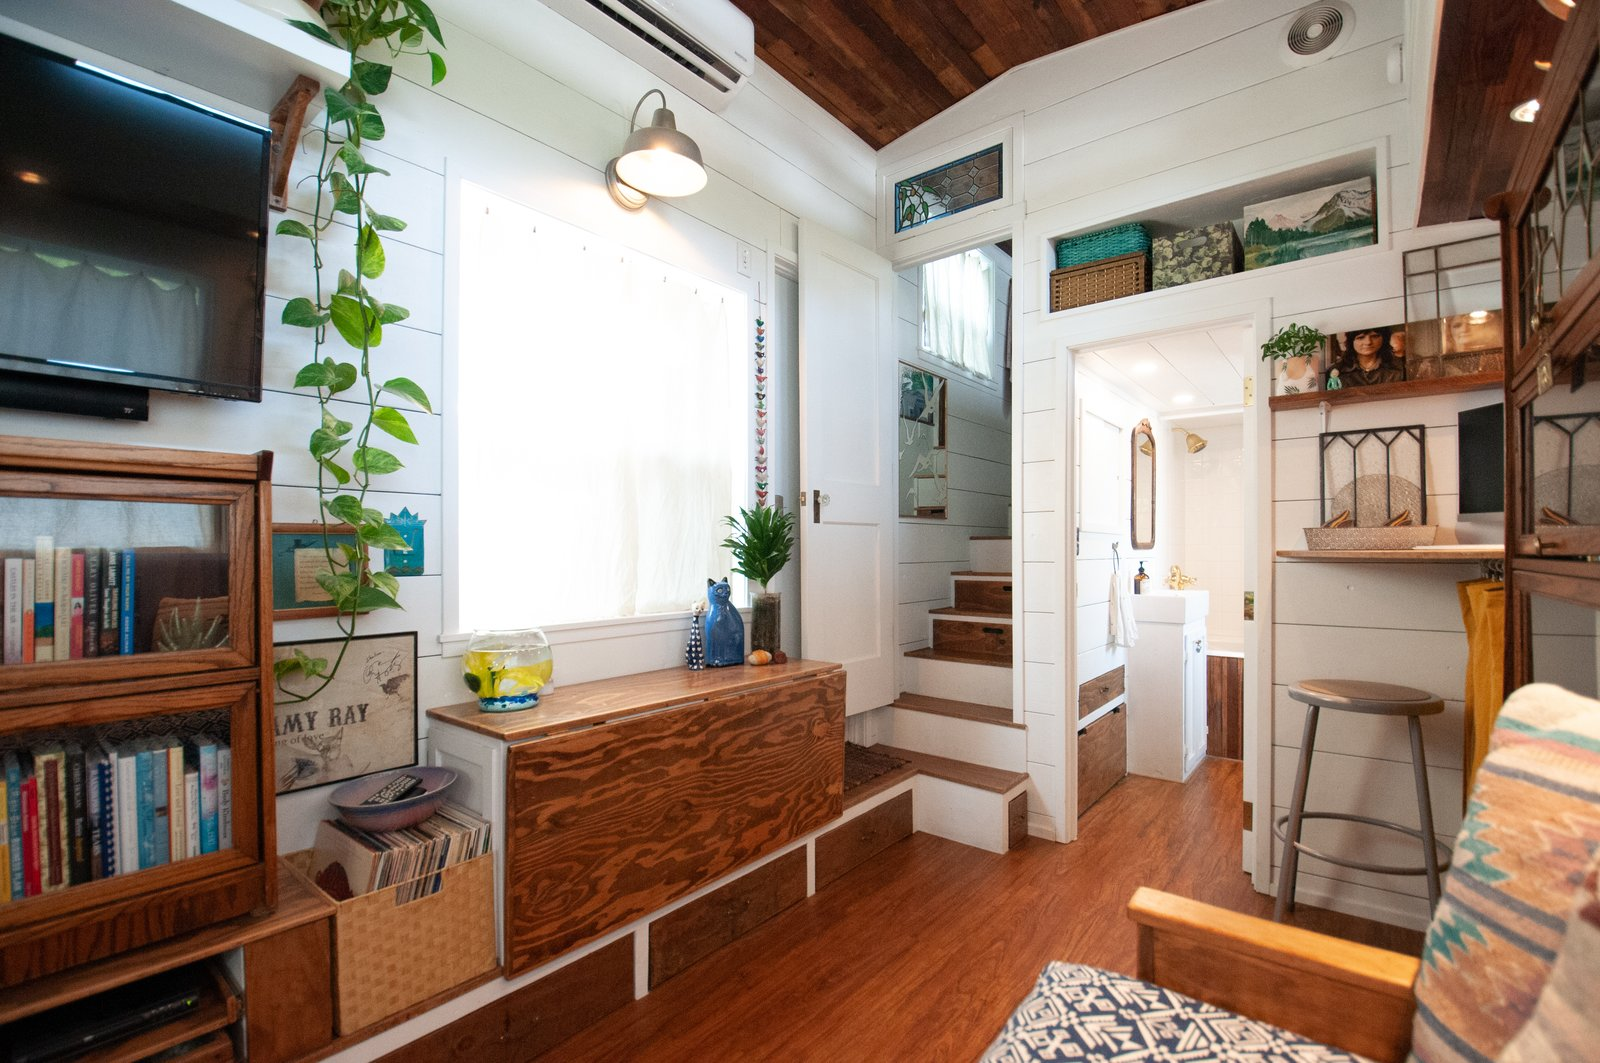 Her Tiny Home living area